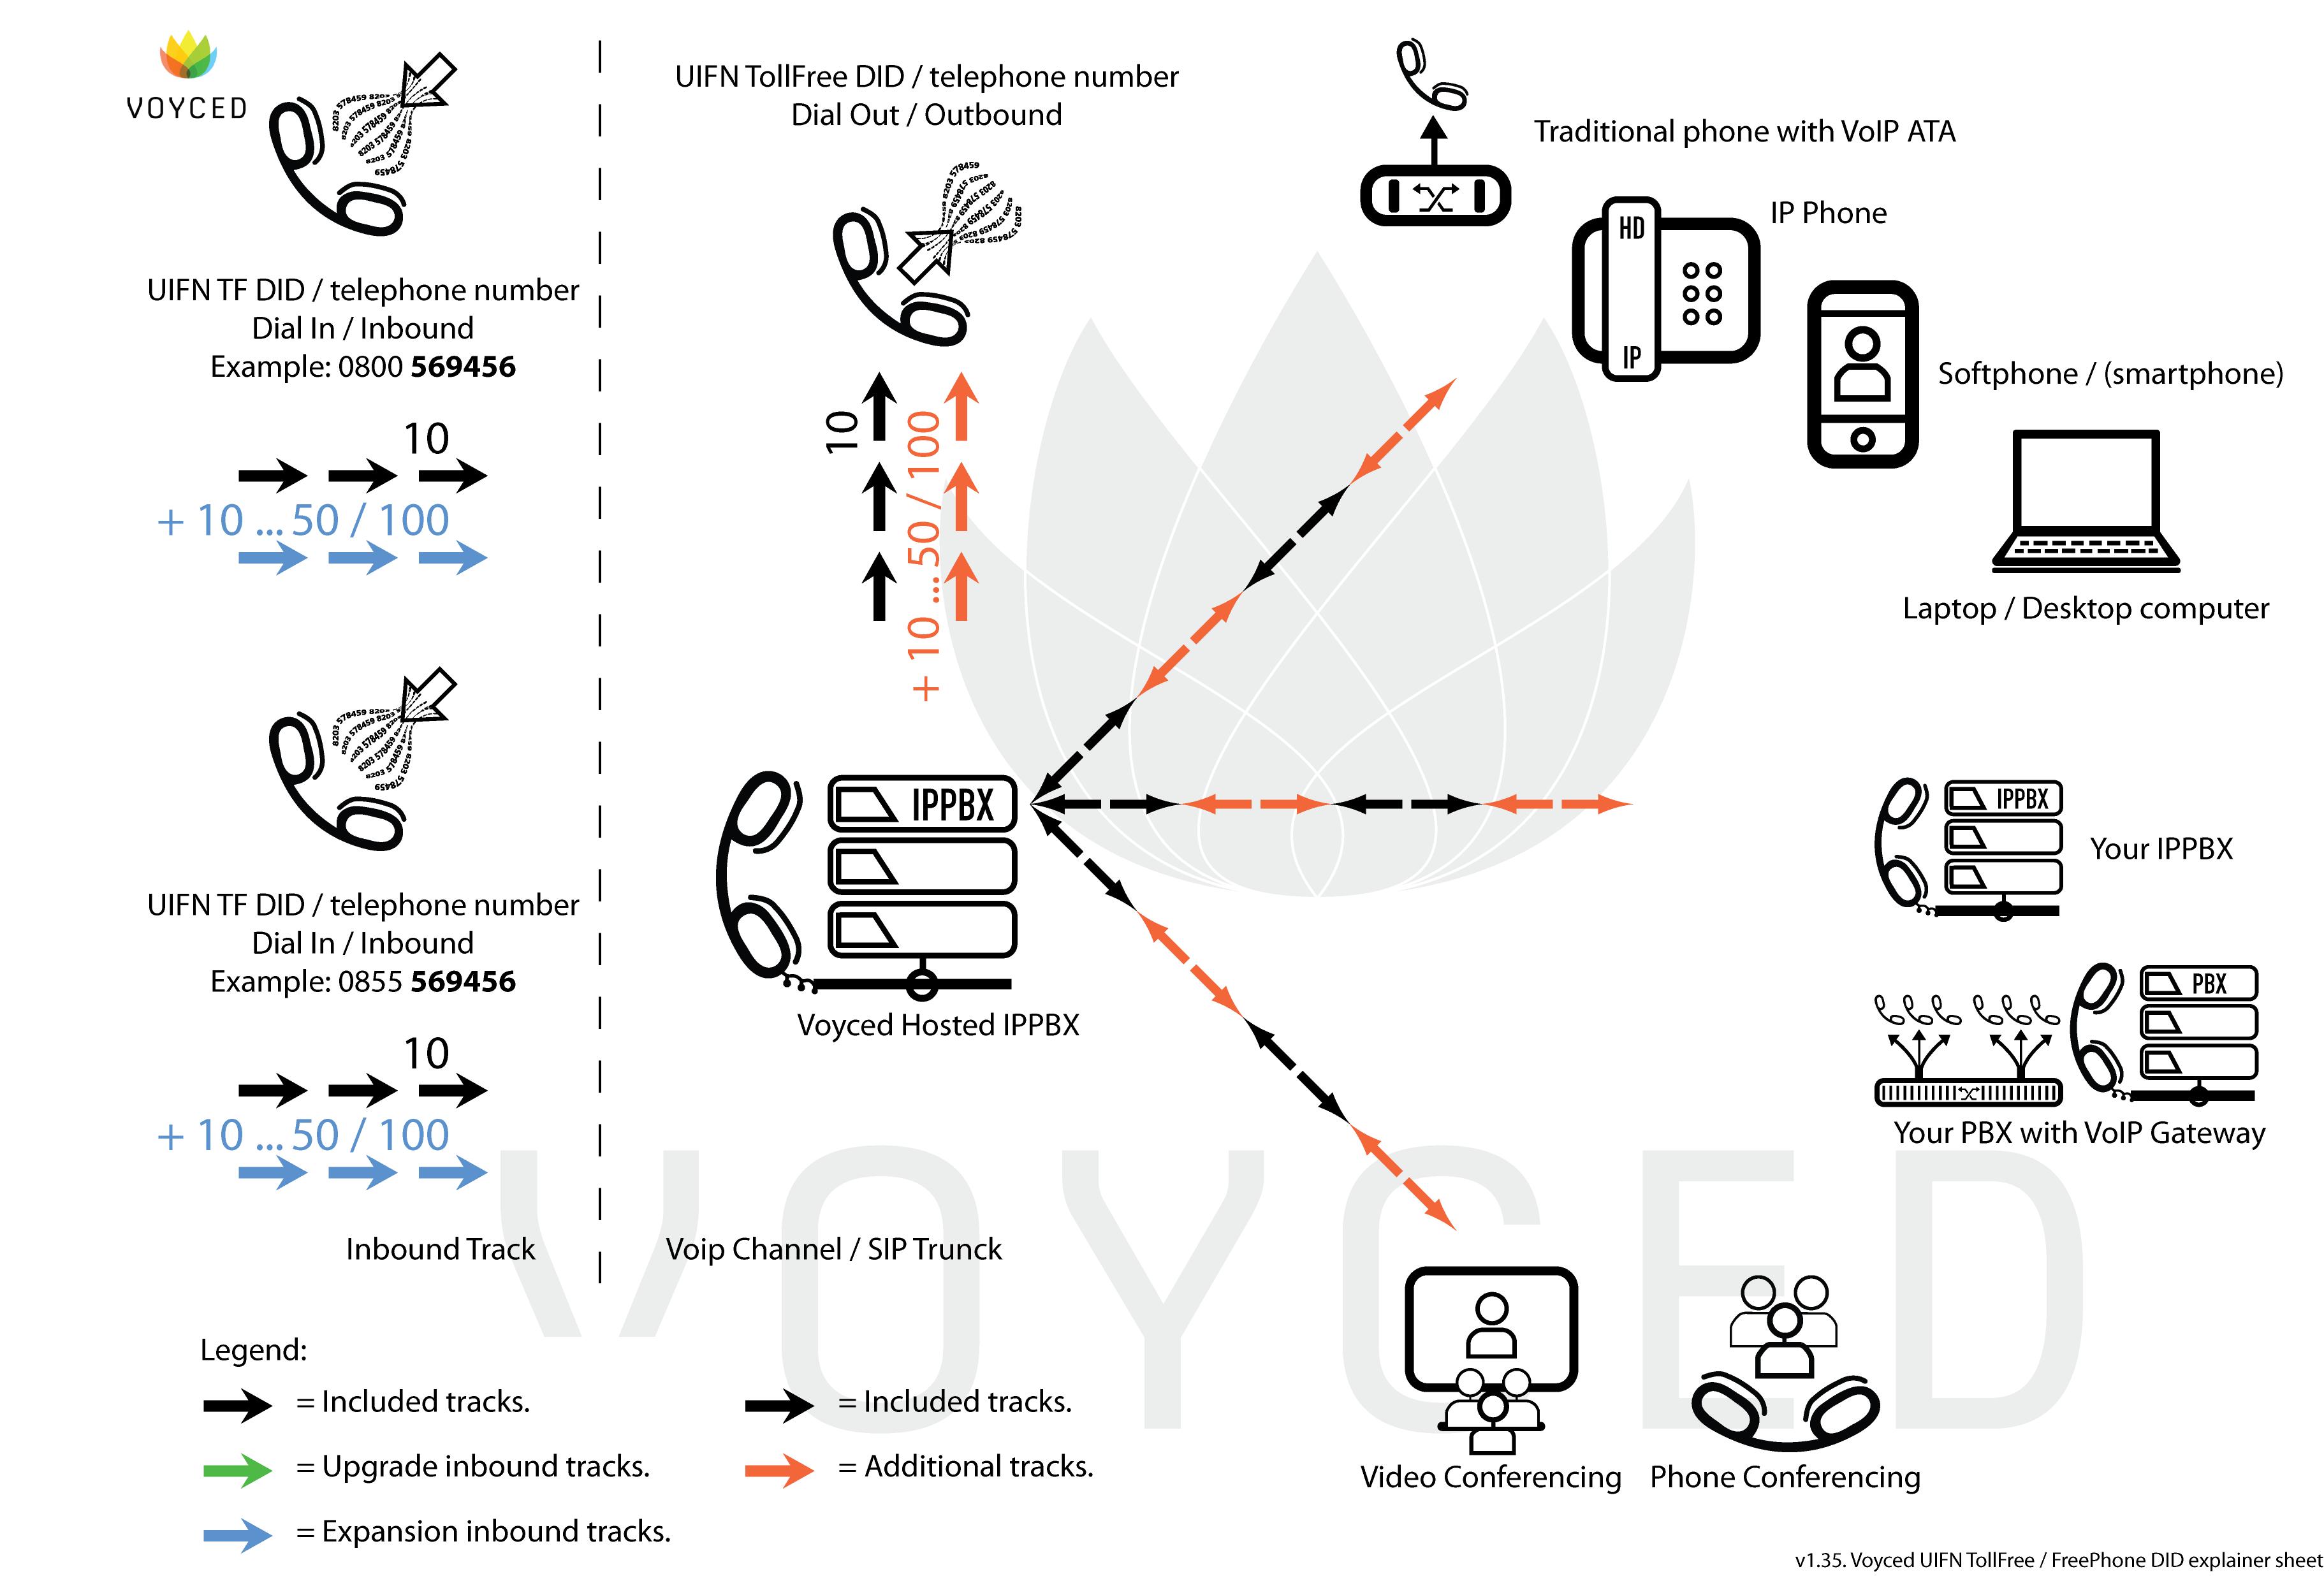 Voyced UIFN TolFree / Freephone DID explainer sheet